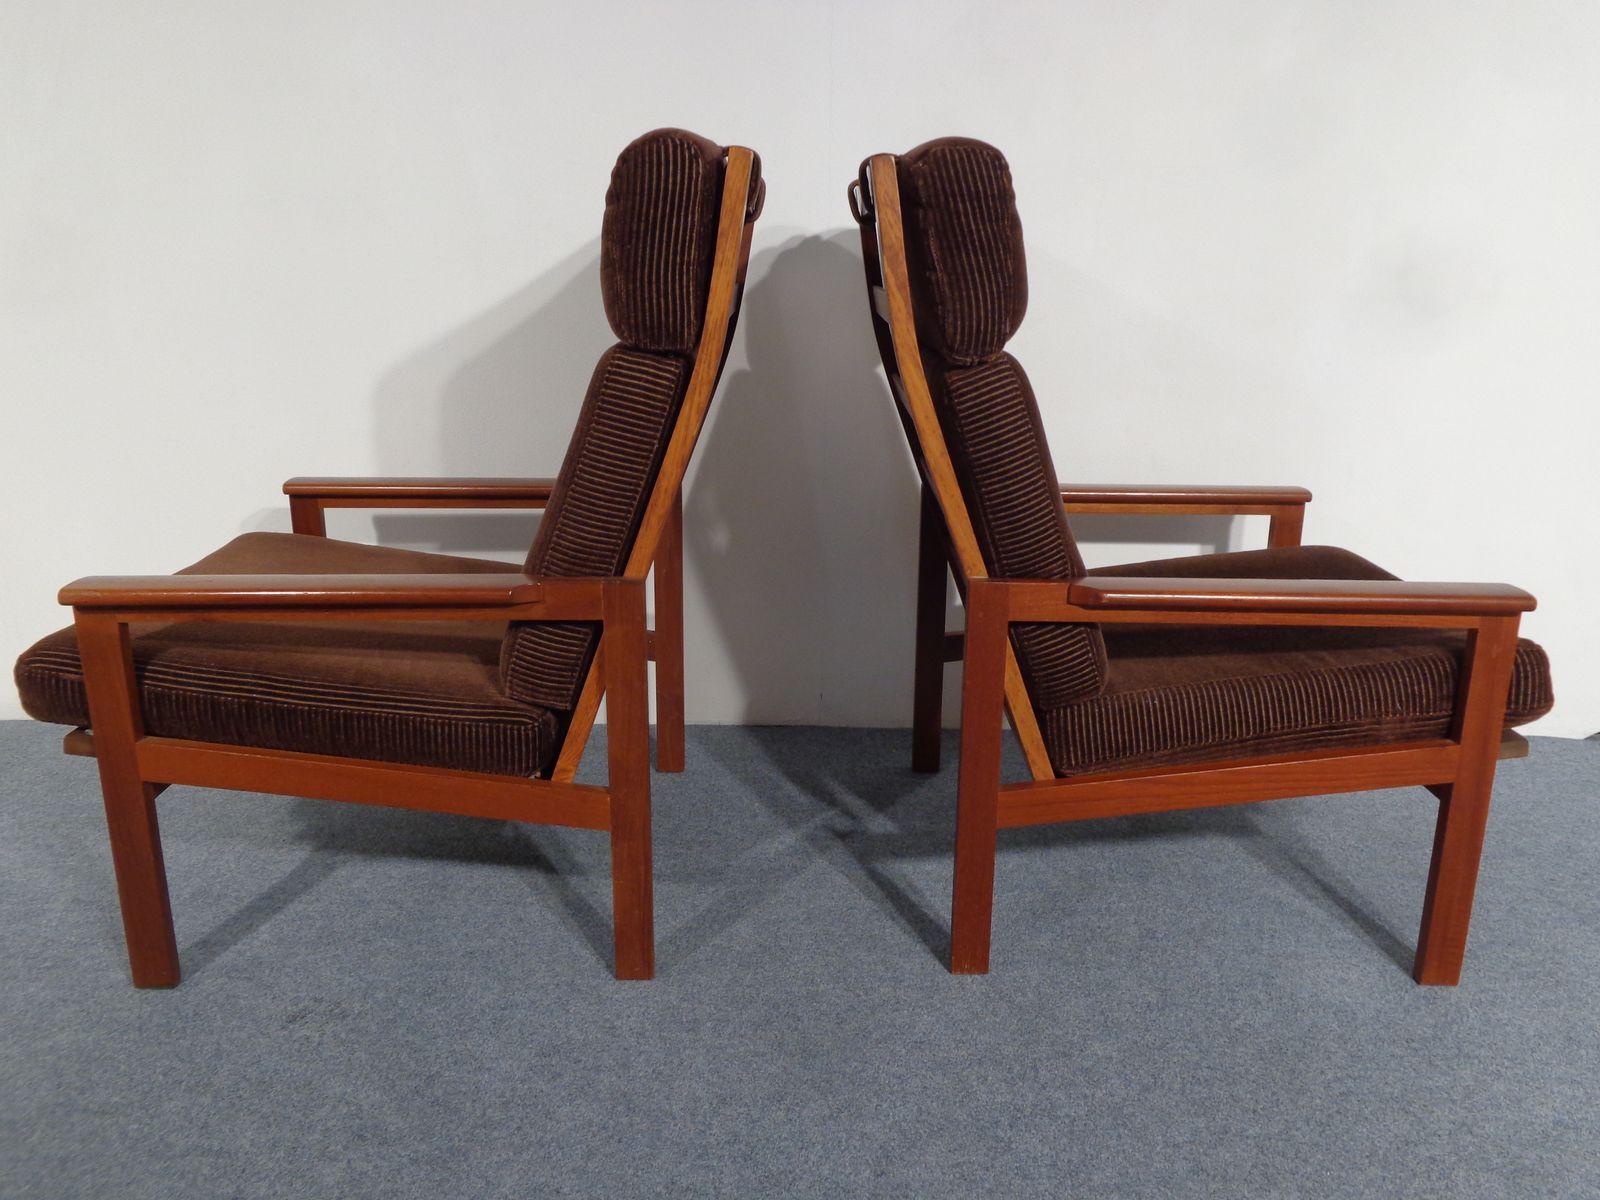 Vintage Teak Chairs by Illum Wikkels¸ and Niels Eilersen Set of 2